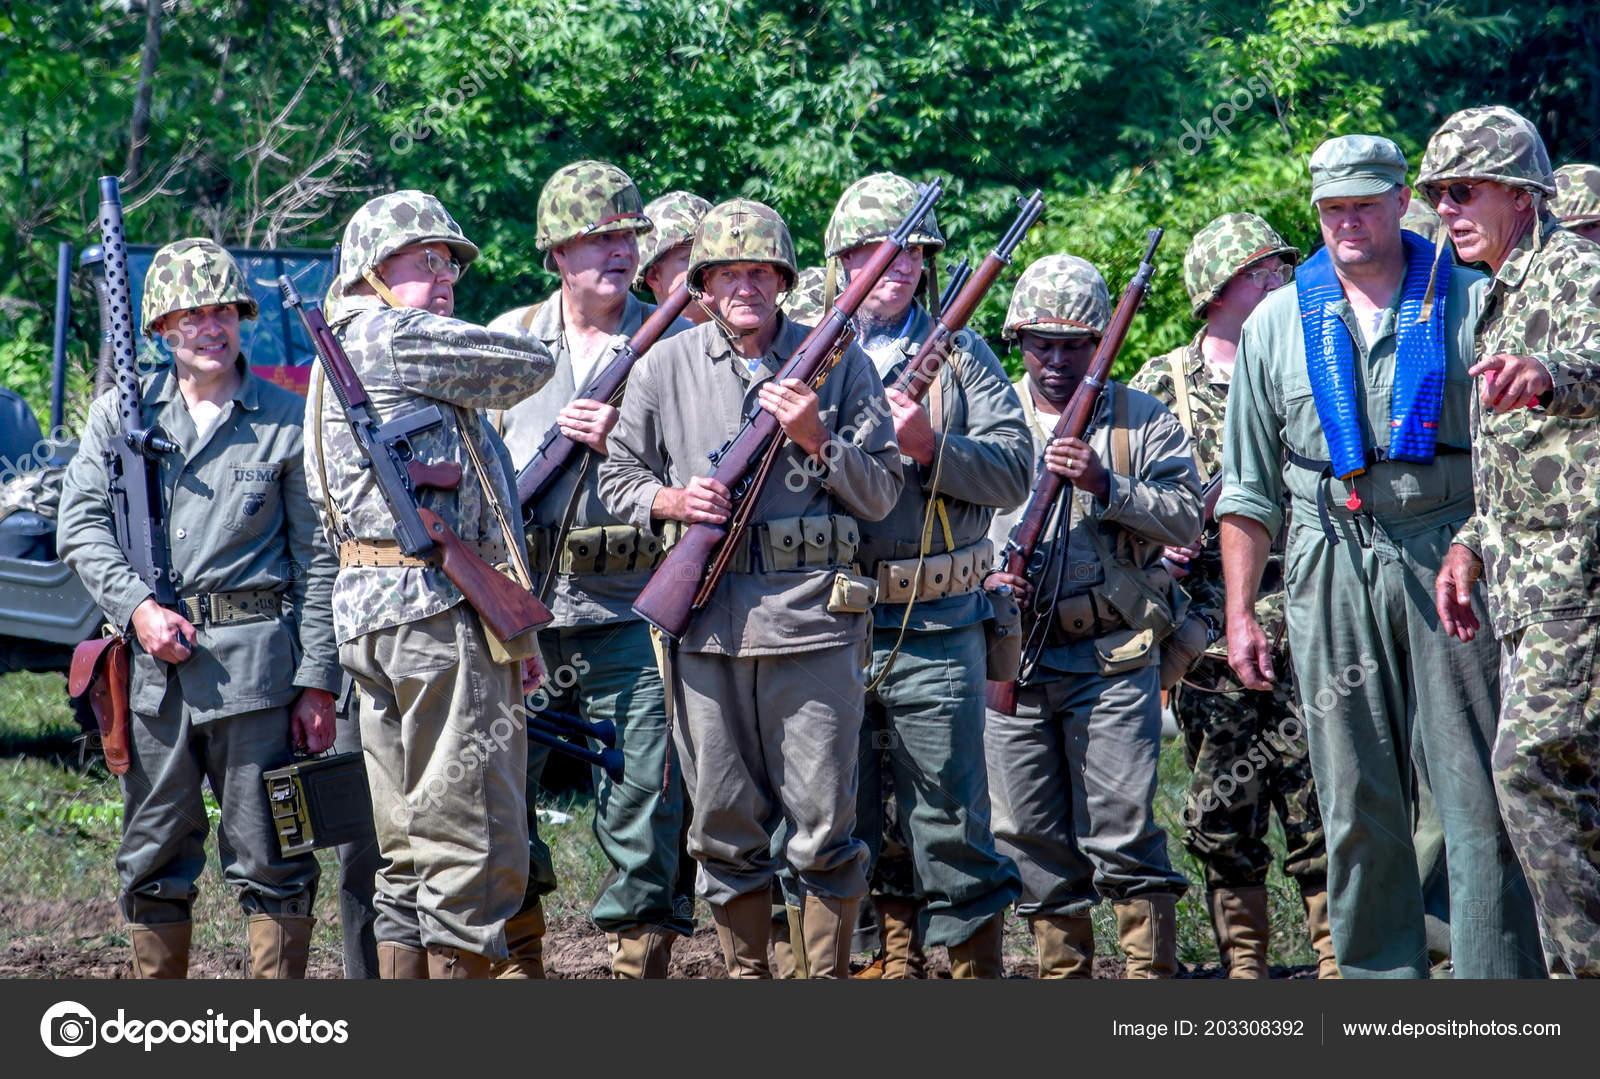 June 2018 Joseph Usa Group Soldiers Vintage Uniforms Vietnam War